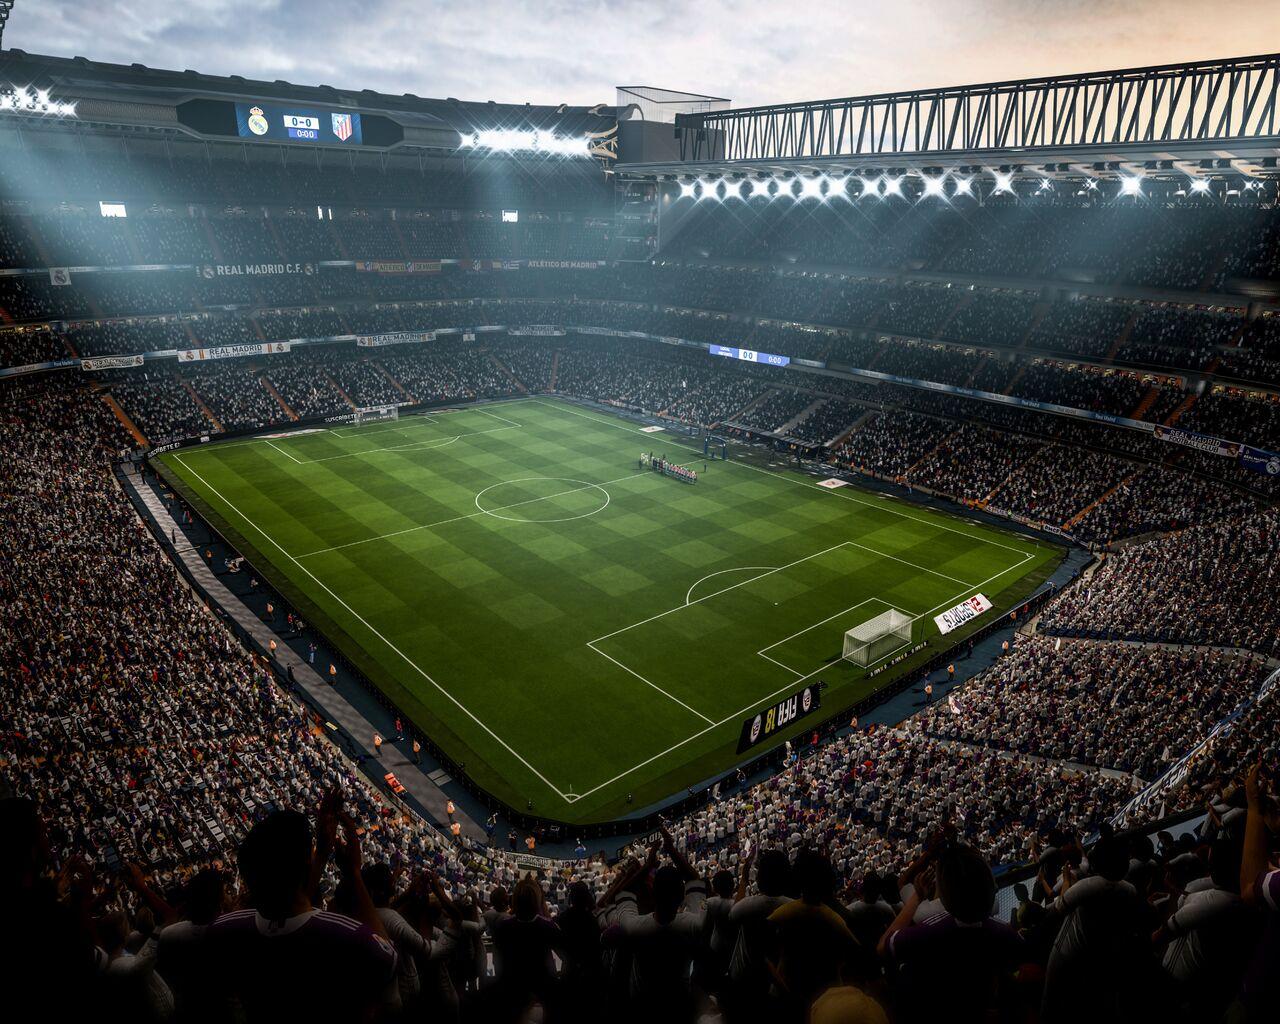 fia-18-stadium-8k-sx.jpg